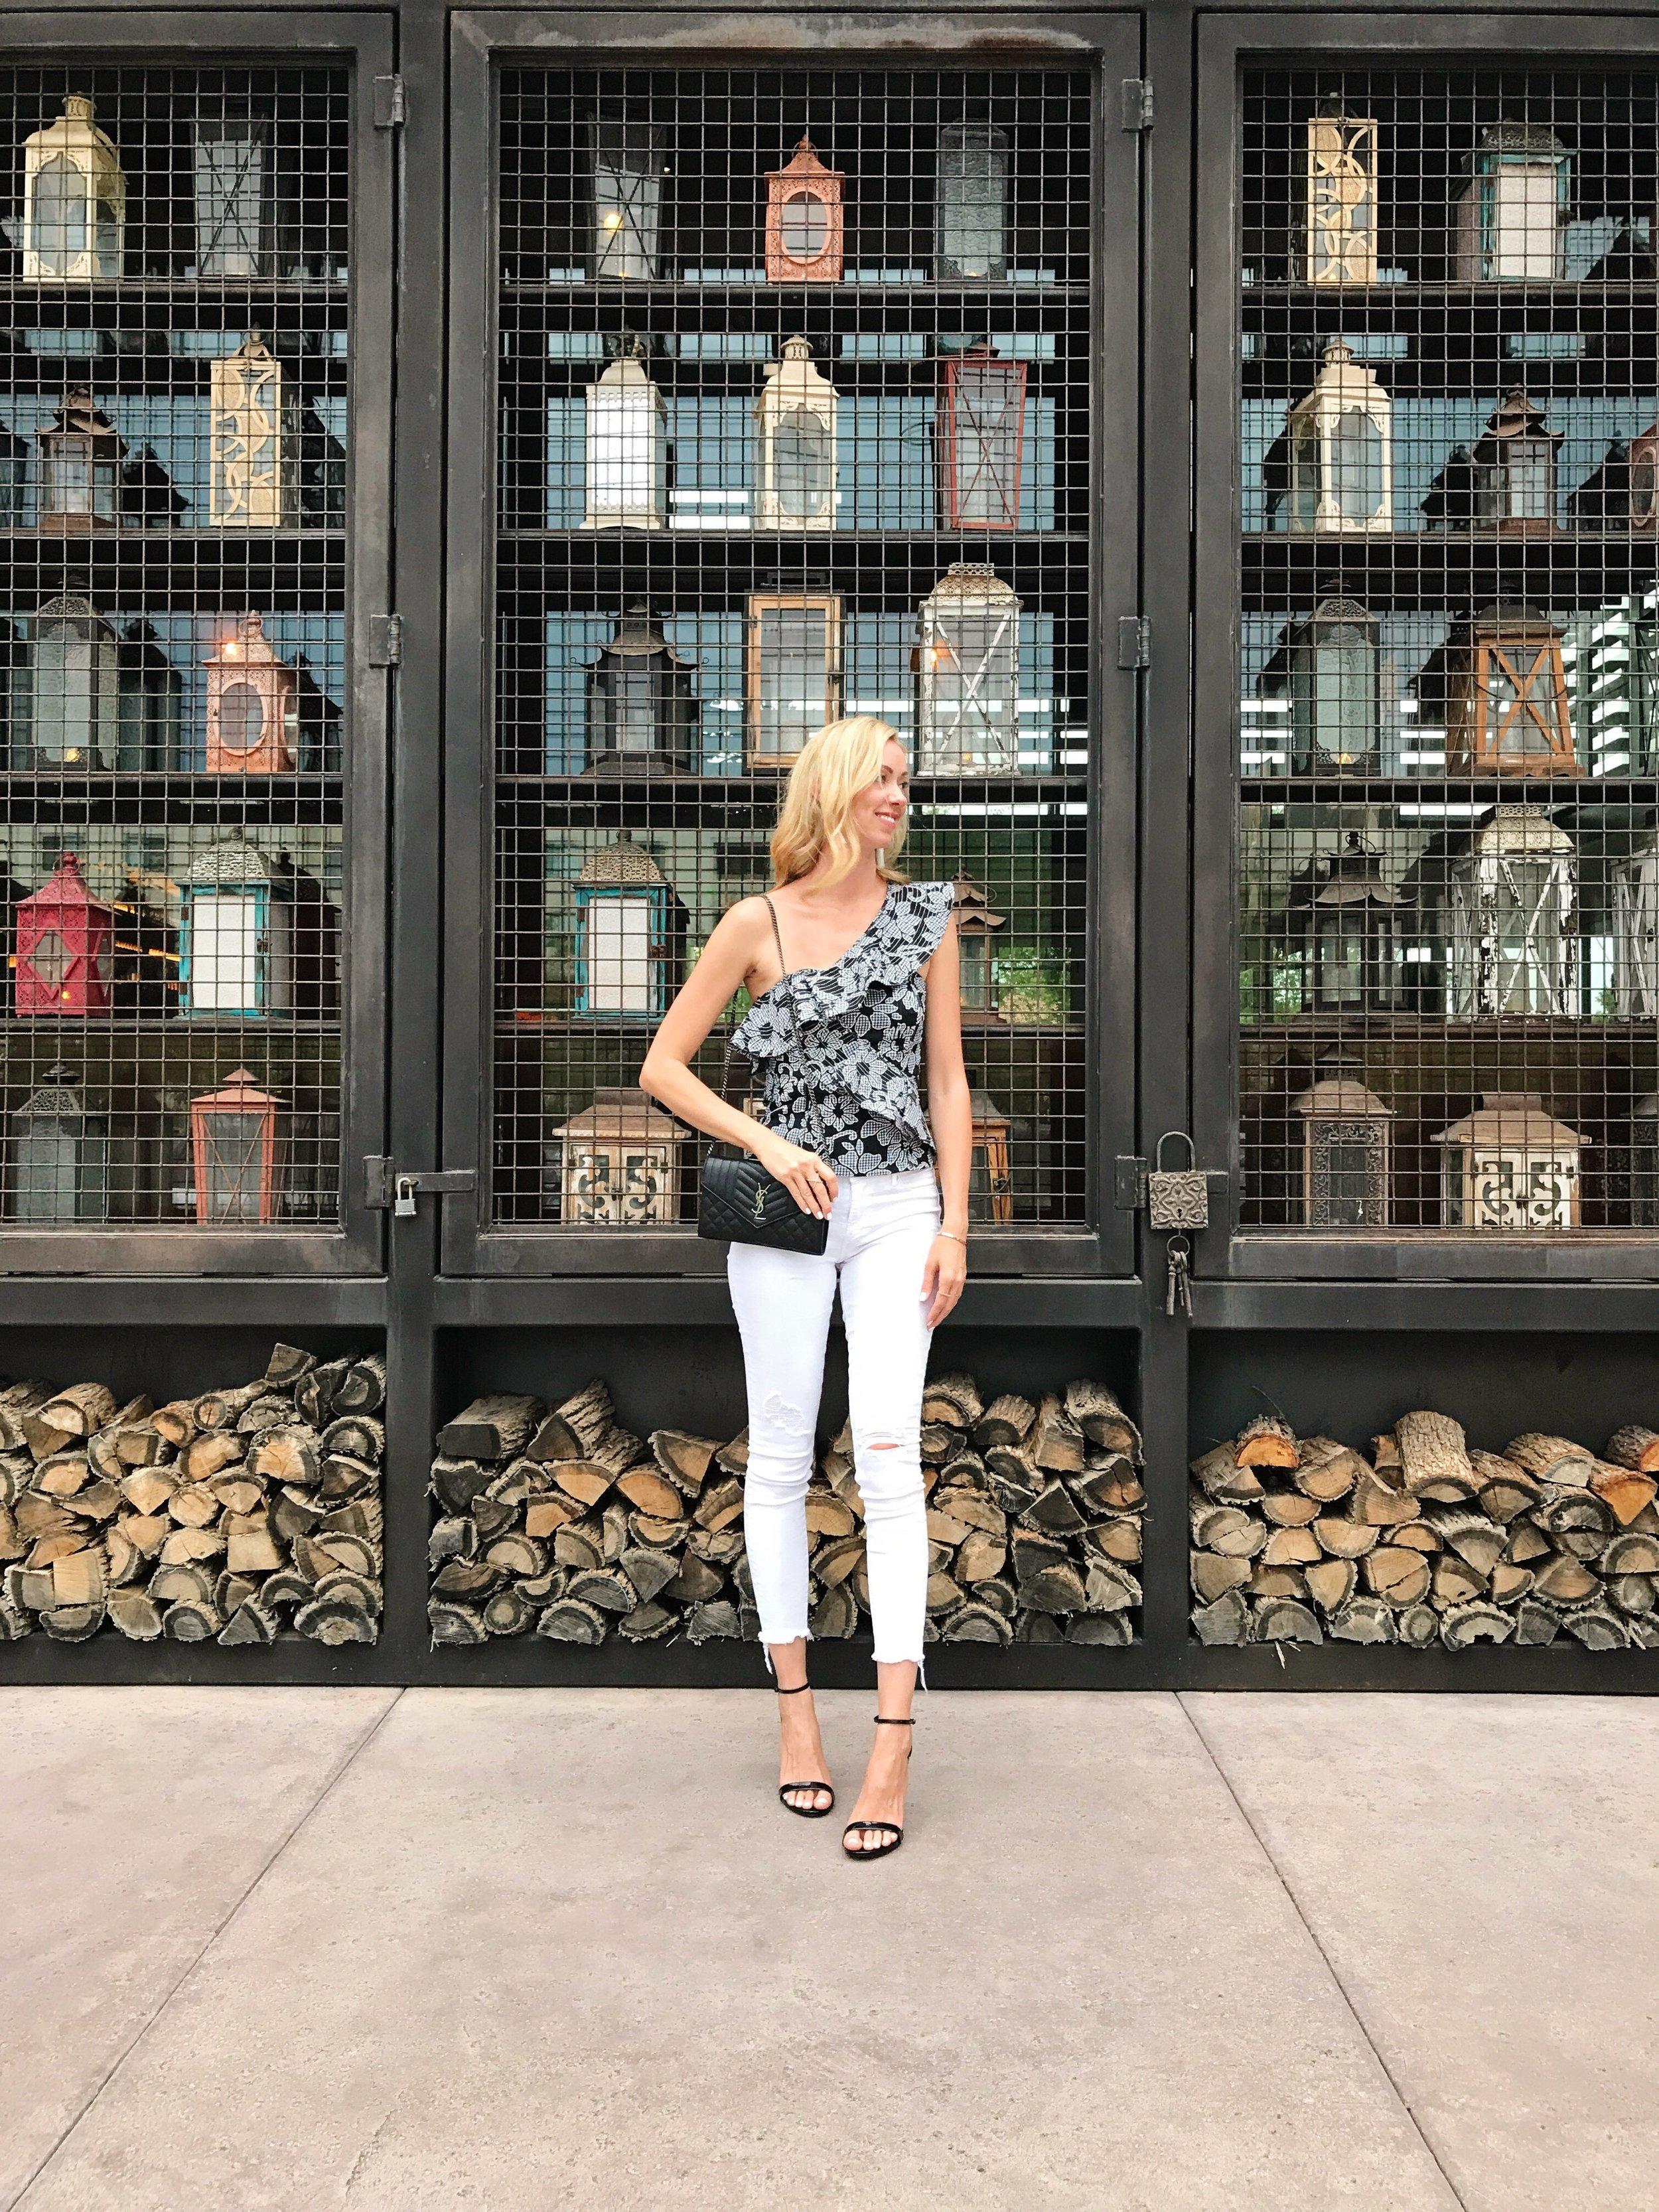 Zara-black-floral-one-shoulder-women's-top-white-jeans.jpg